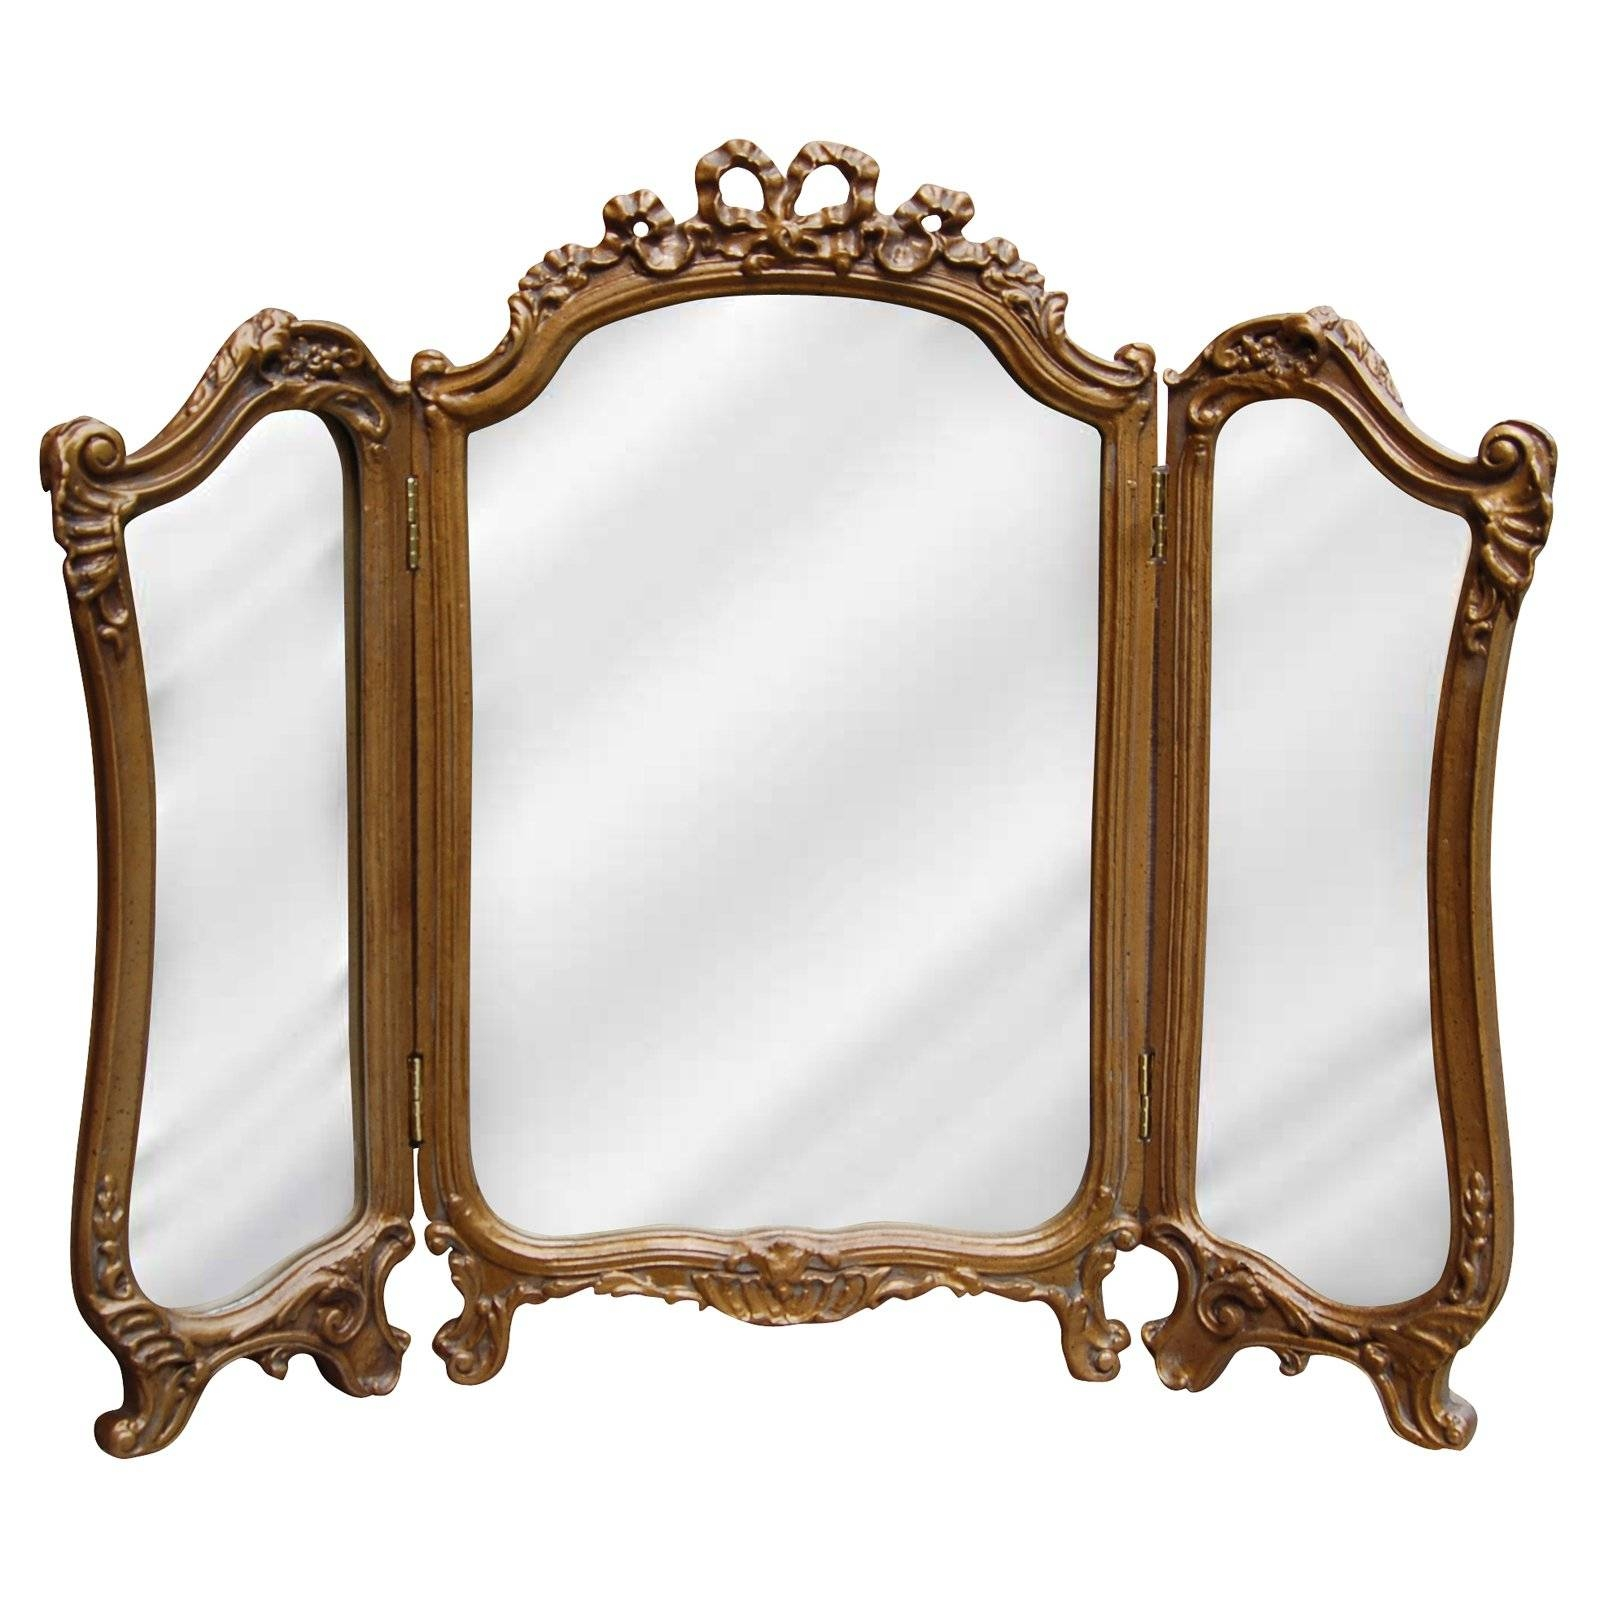 Mirrors - Walmart regarding Where to Buy Vintage Mirrors (Image 12 of 15)